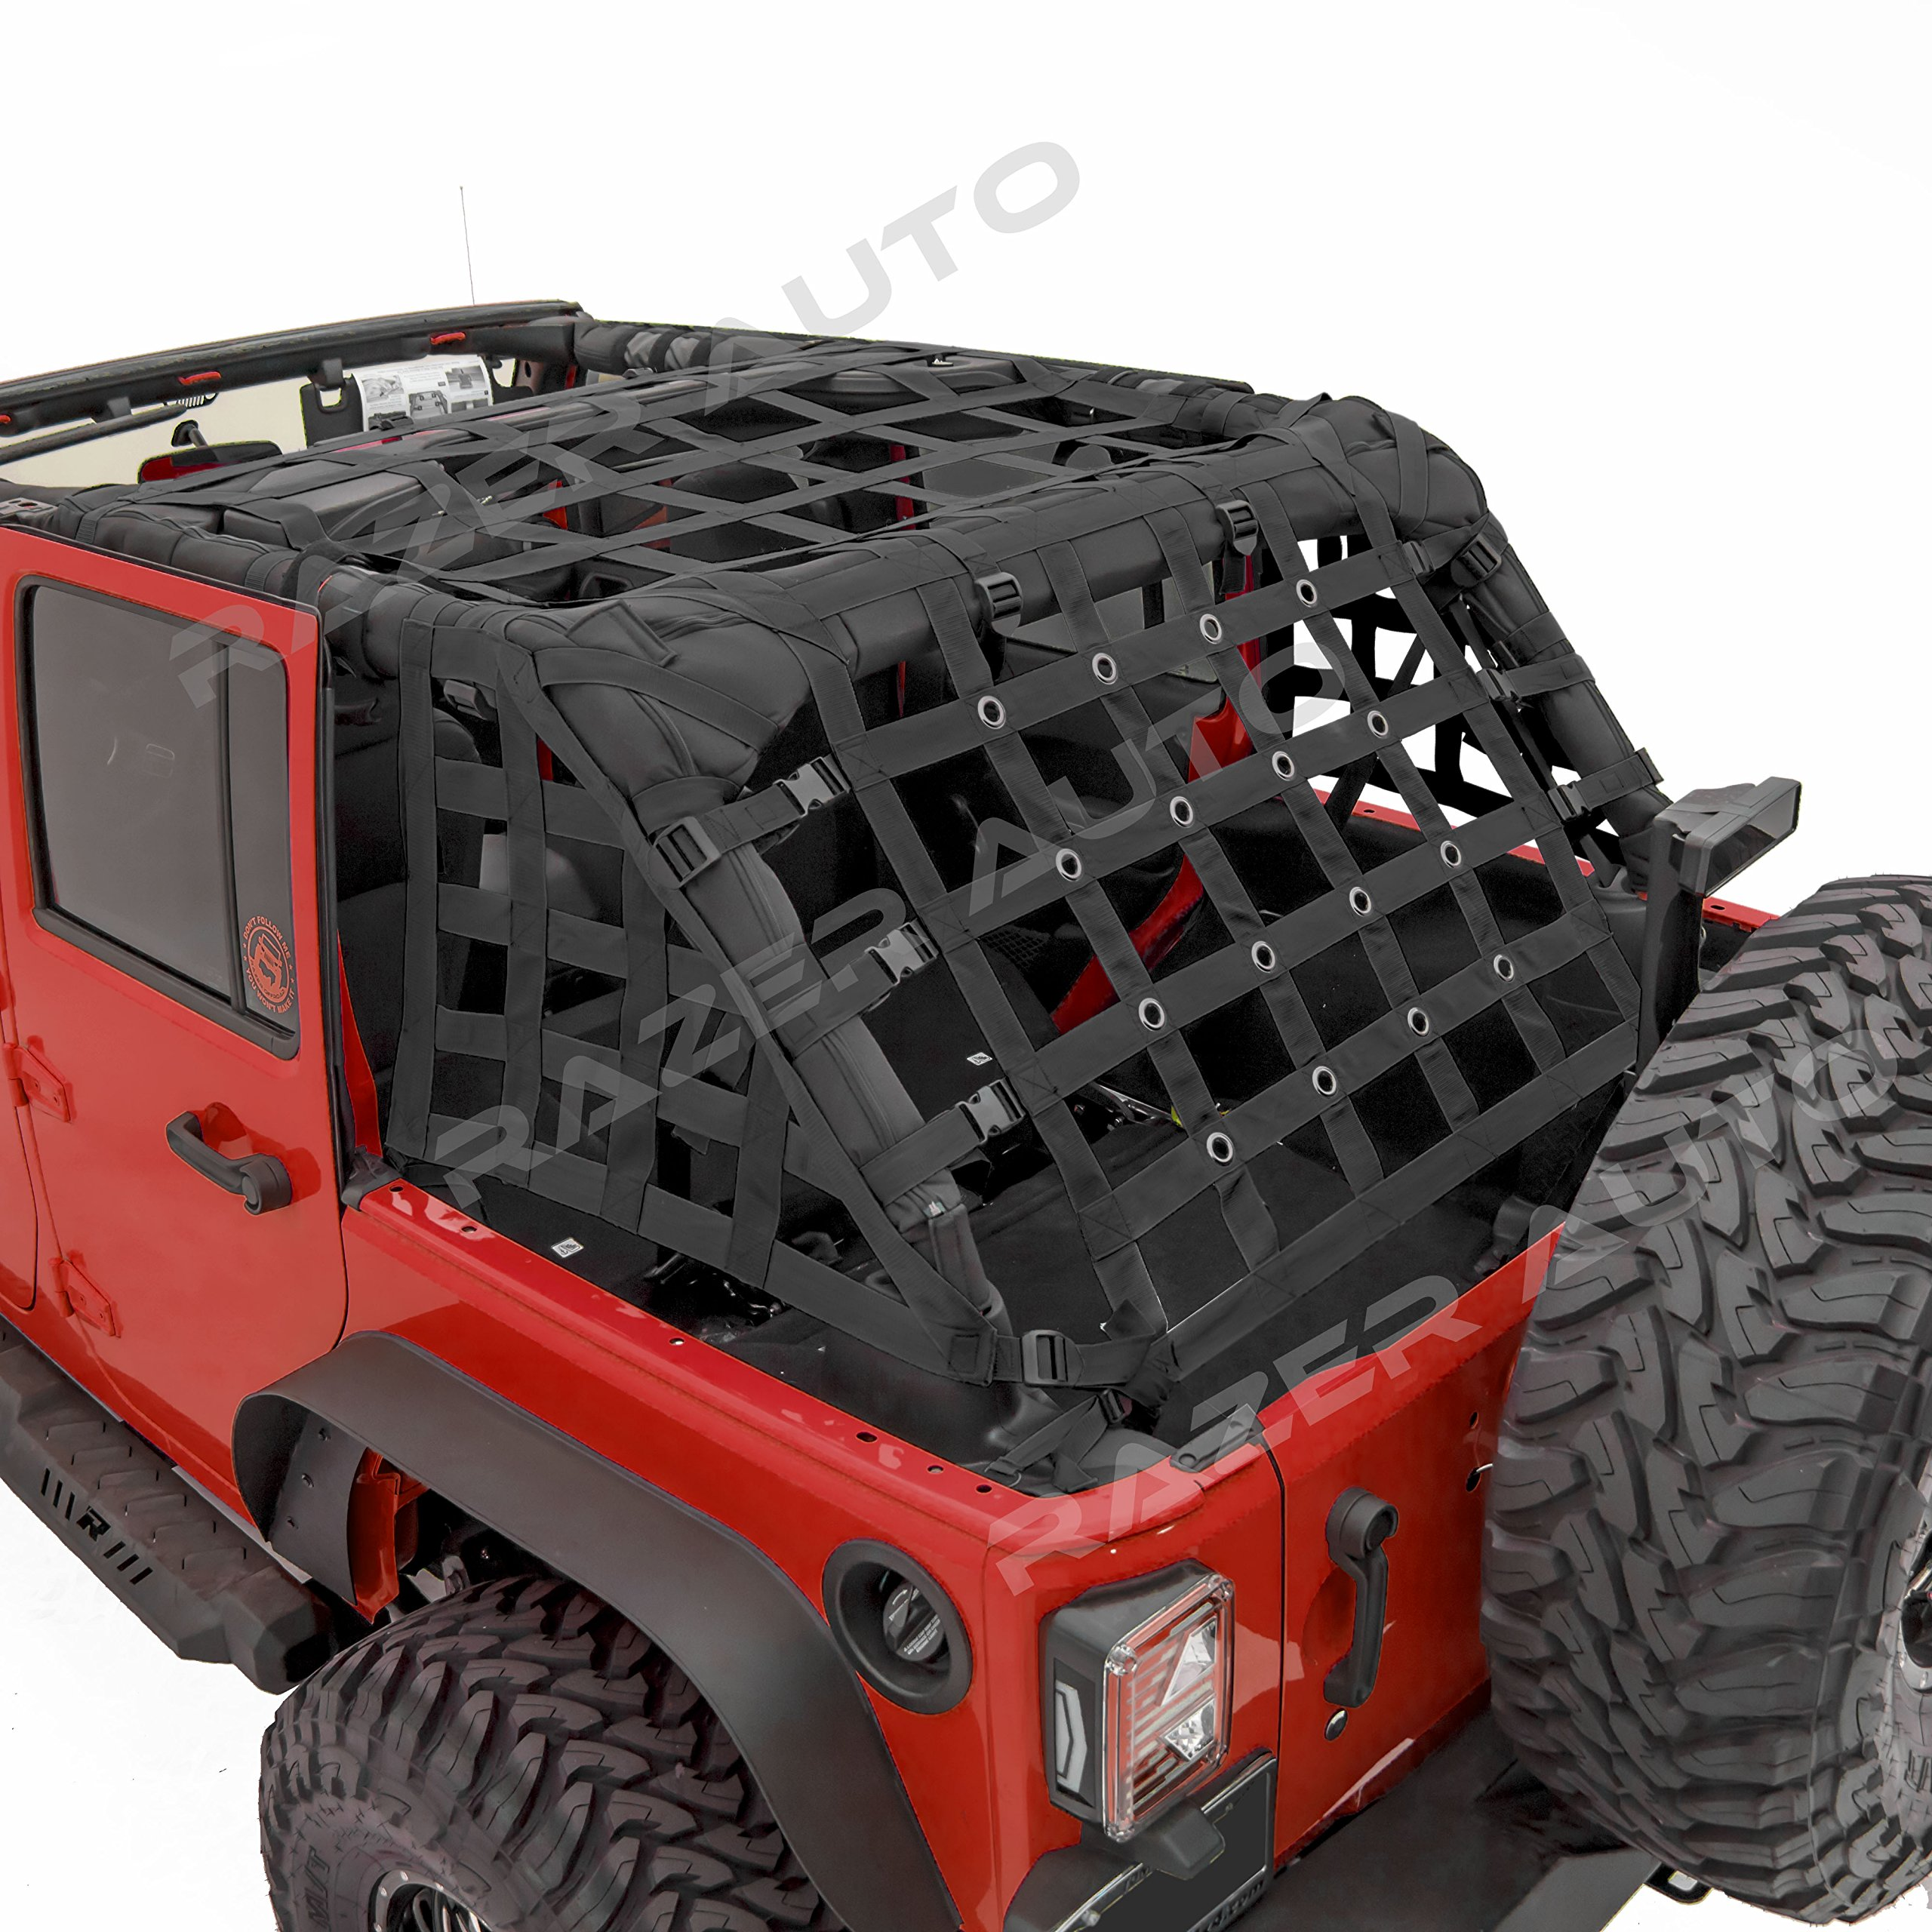 Razer Auto 4 Door Model Only Black Cargo Restraint Net System Trail Cargo Net (Black) for 07-18 Jeep Wrangler JK